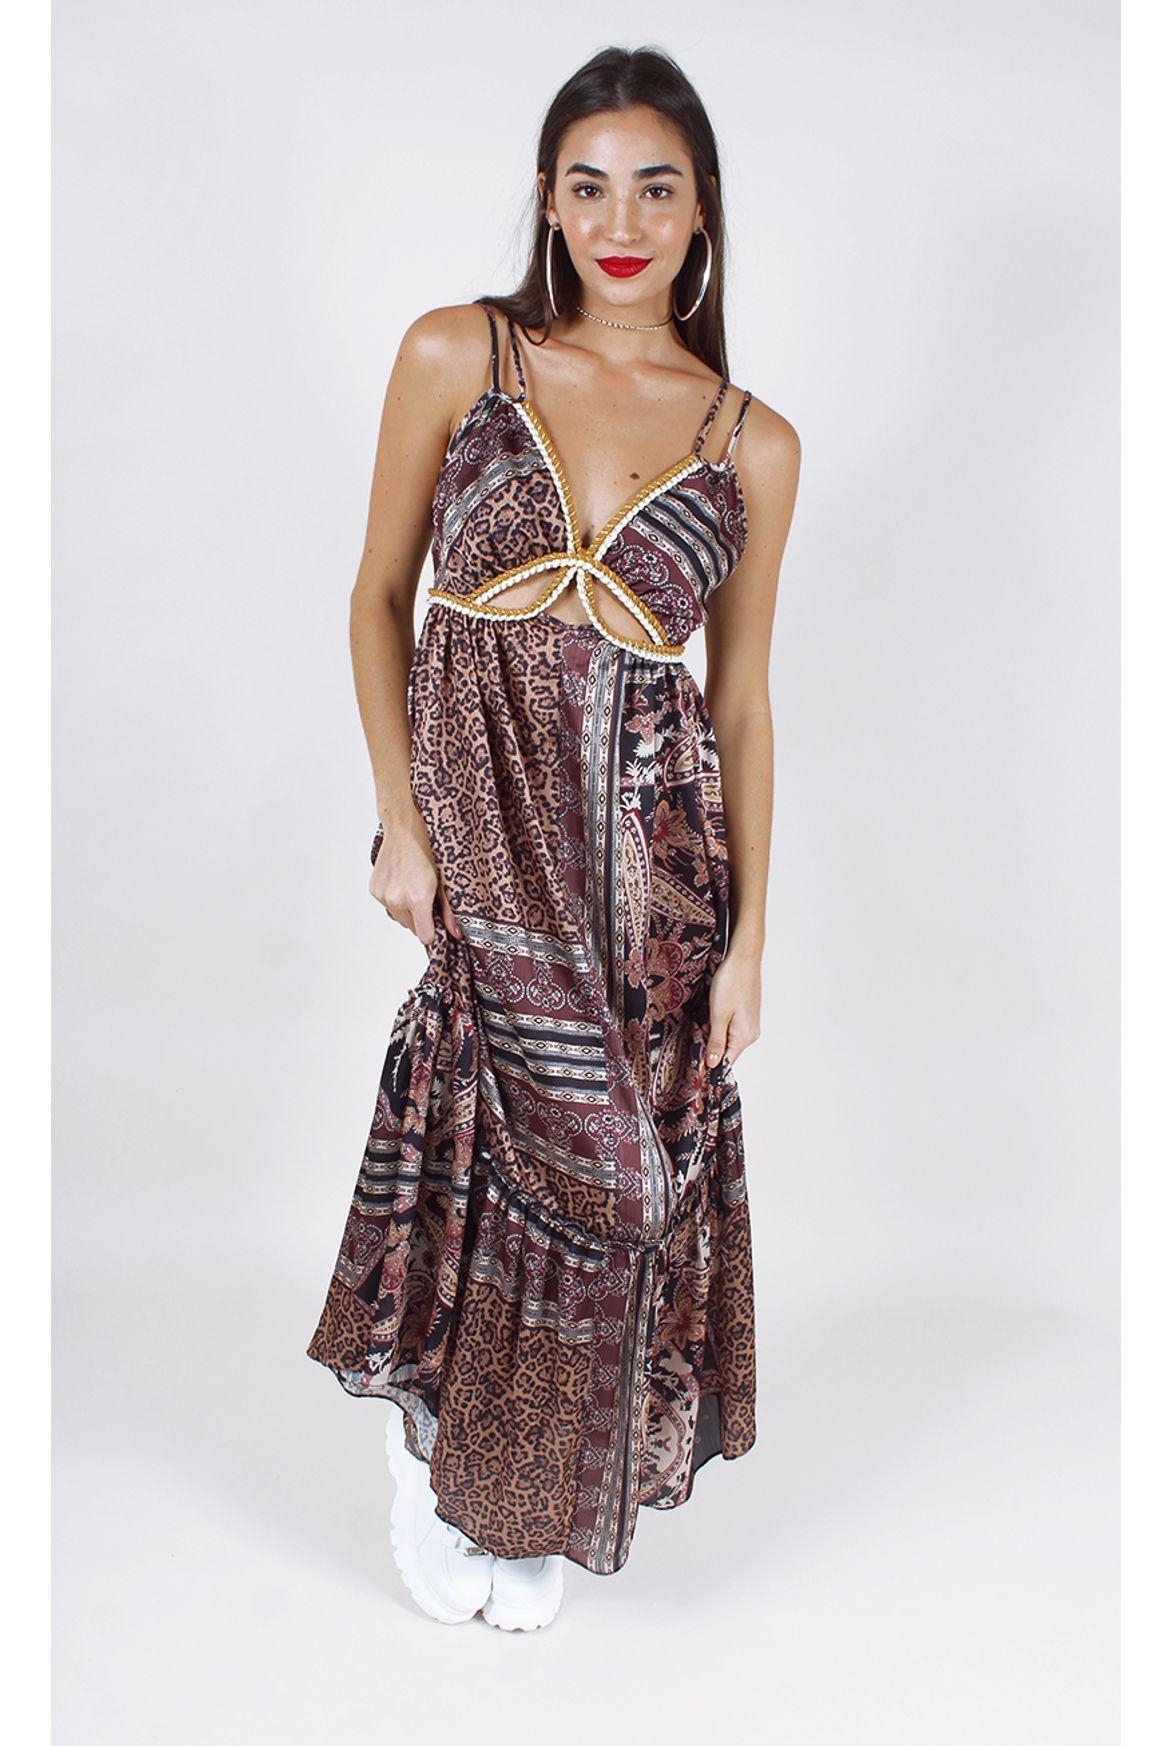 d1852f68033 FSHN - vestido mayra longo w/ recortes marrom - Fashion Closet